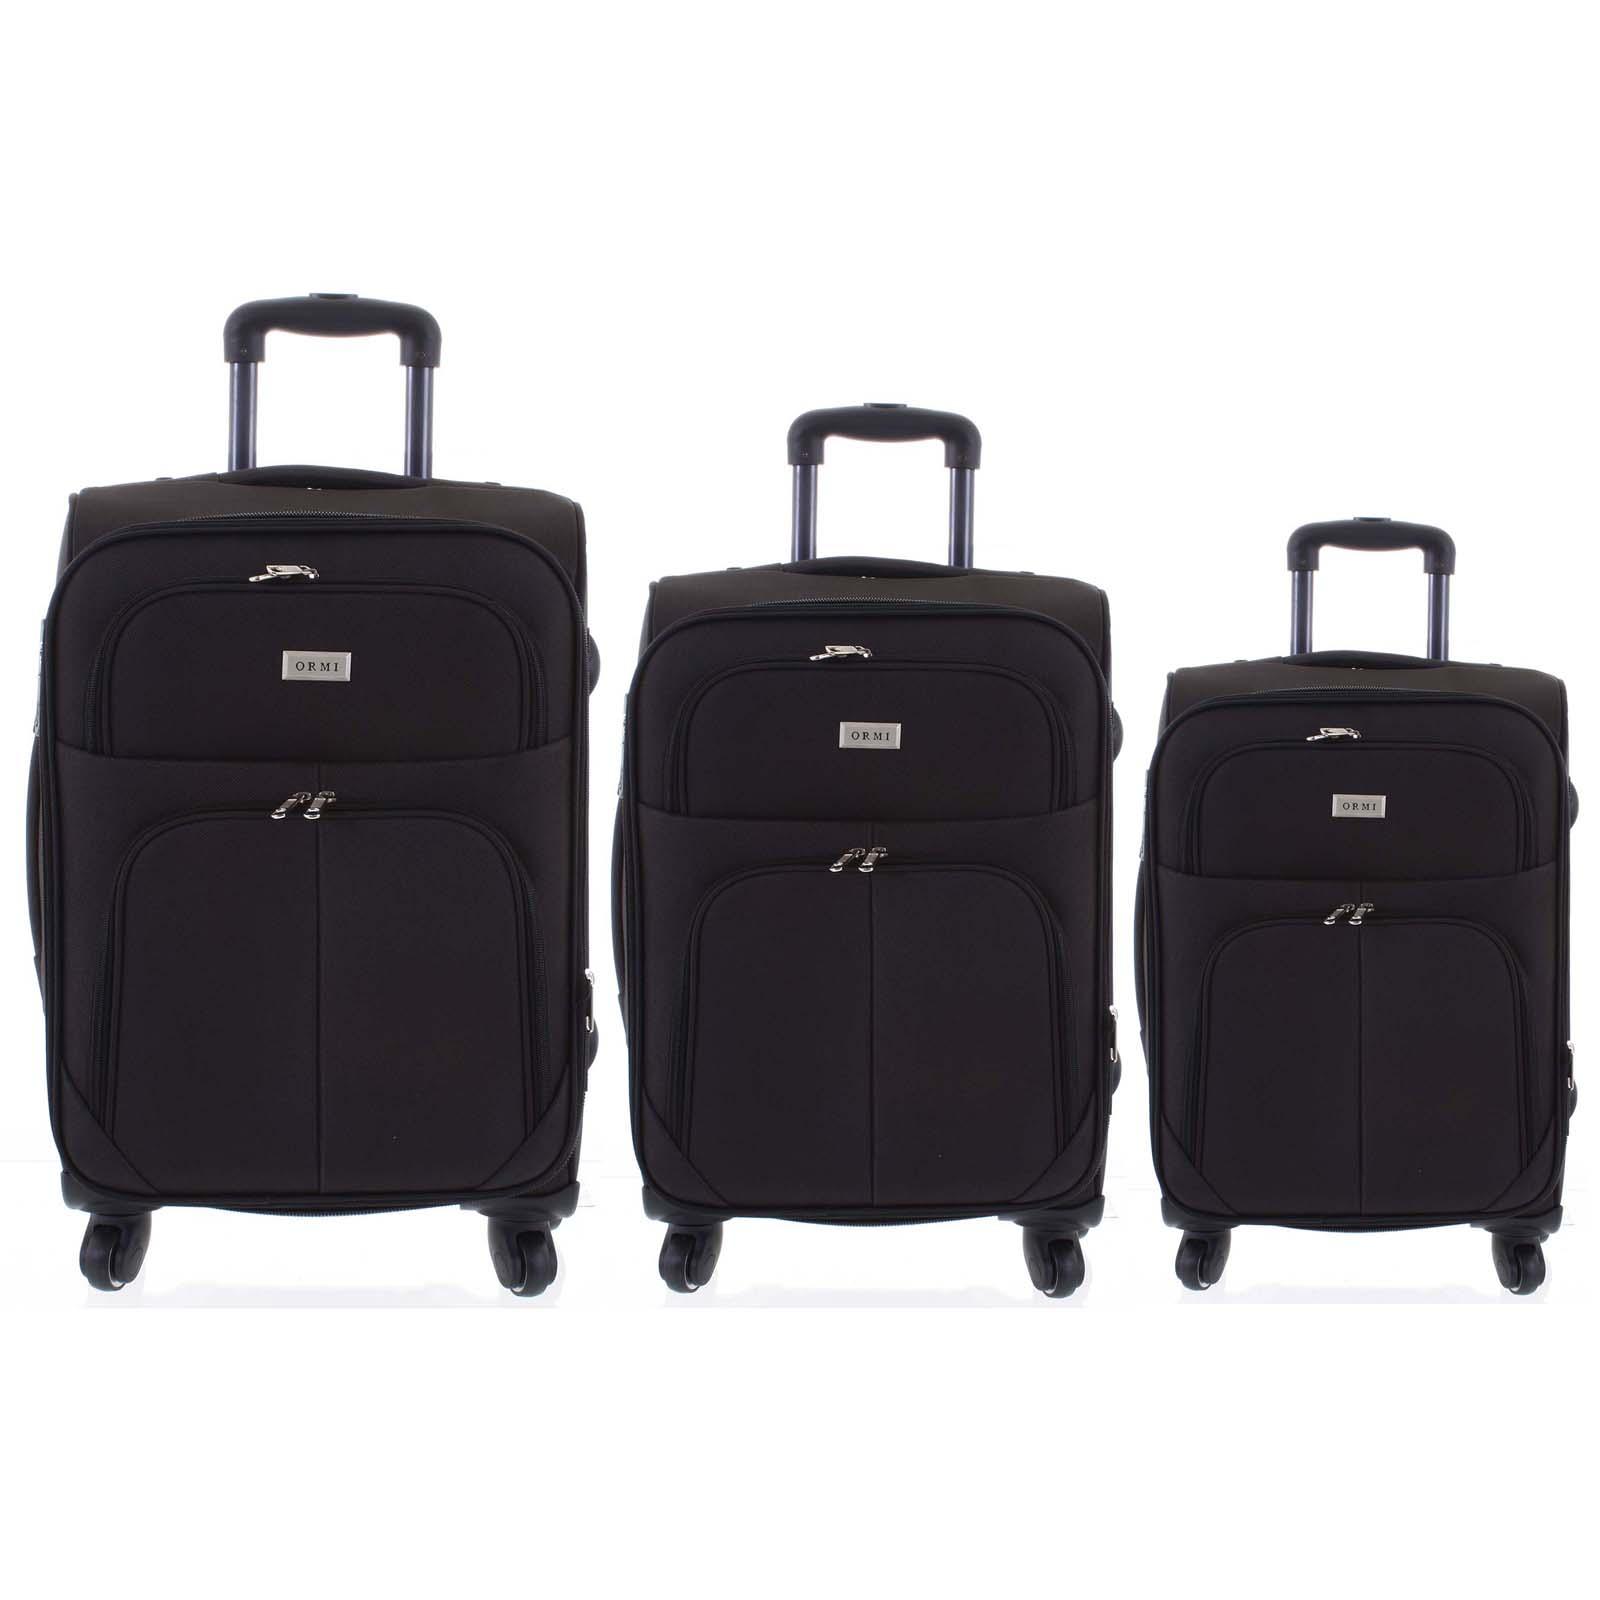 Cestovní kufr černý sada - Ormi Tessa S, M, L